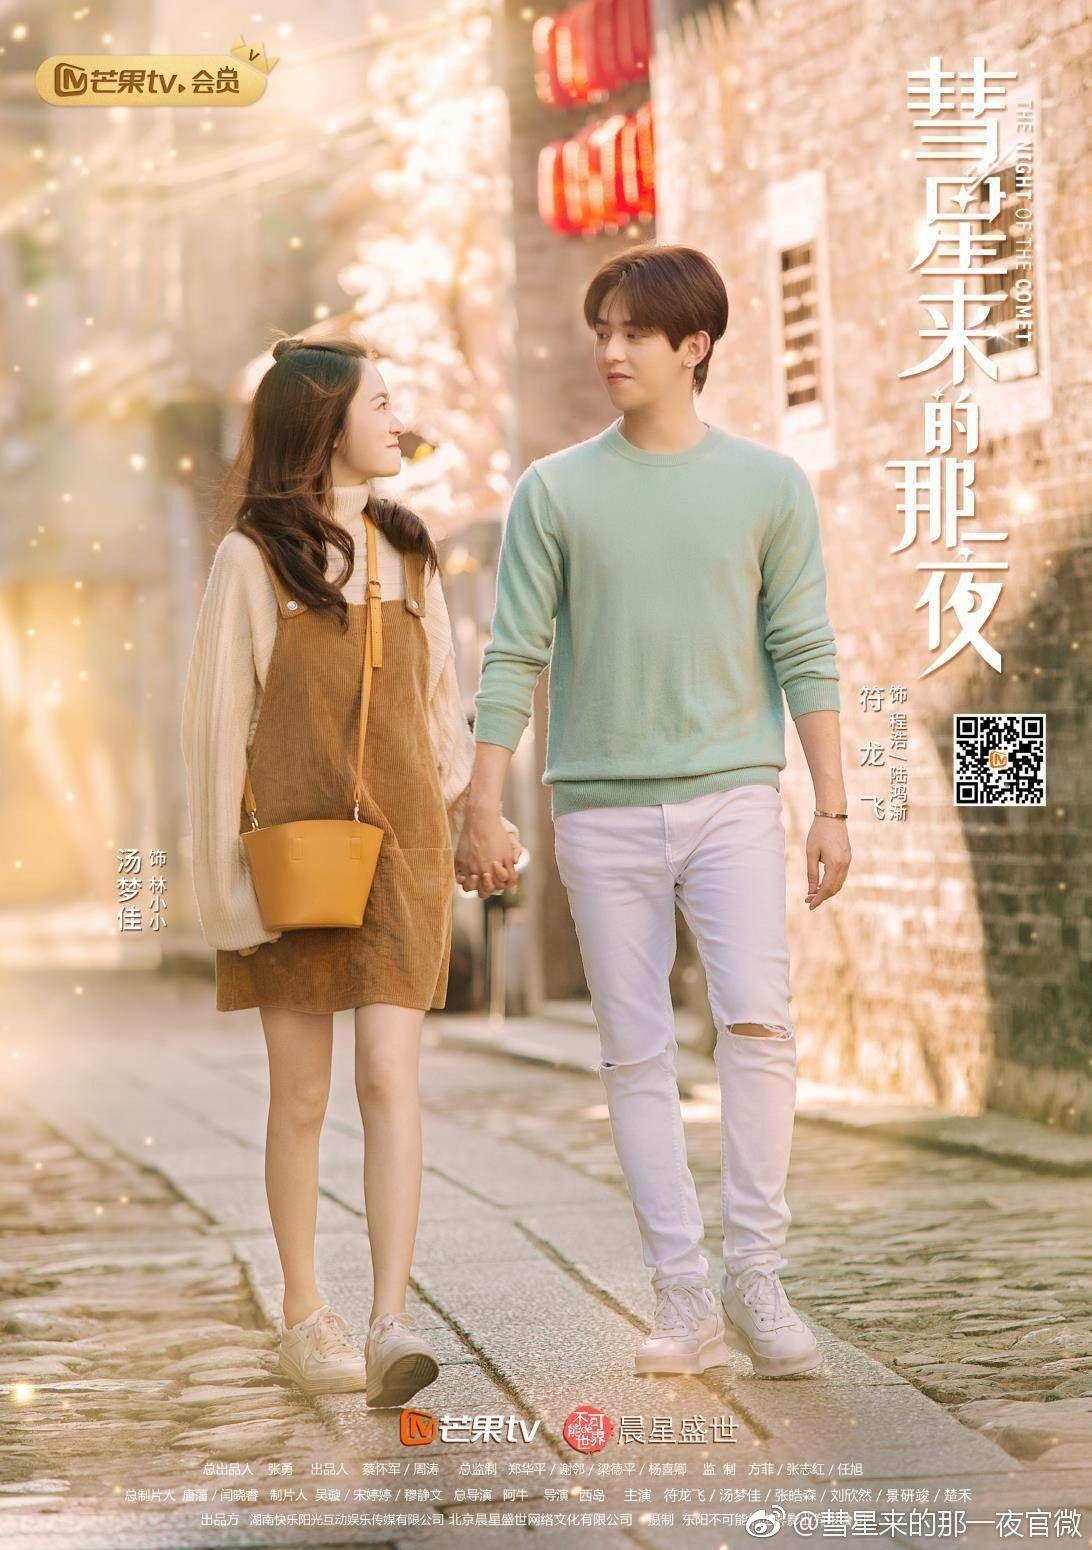 Pin By Kɪɴɢ Min On Dorama New Korean Drama Korean Drama Tv Korean Drama Romance